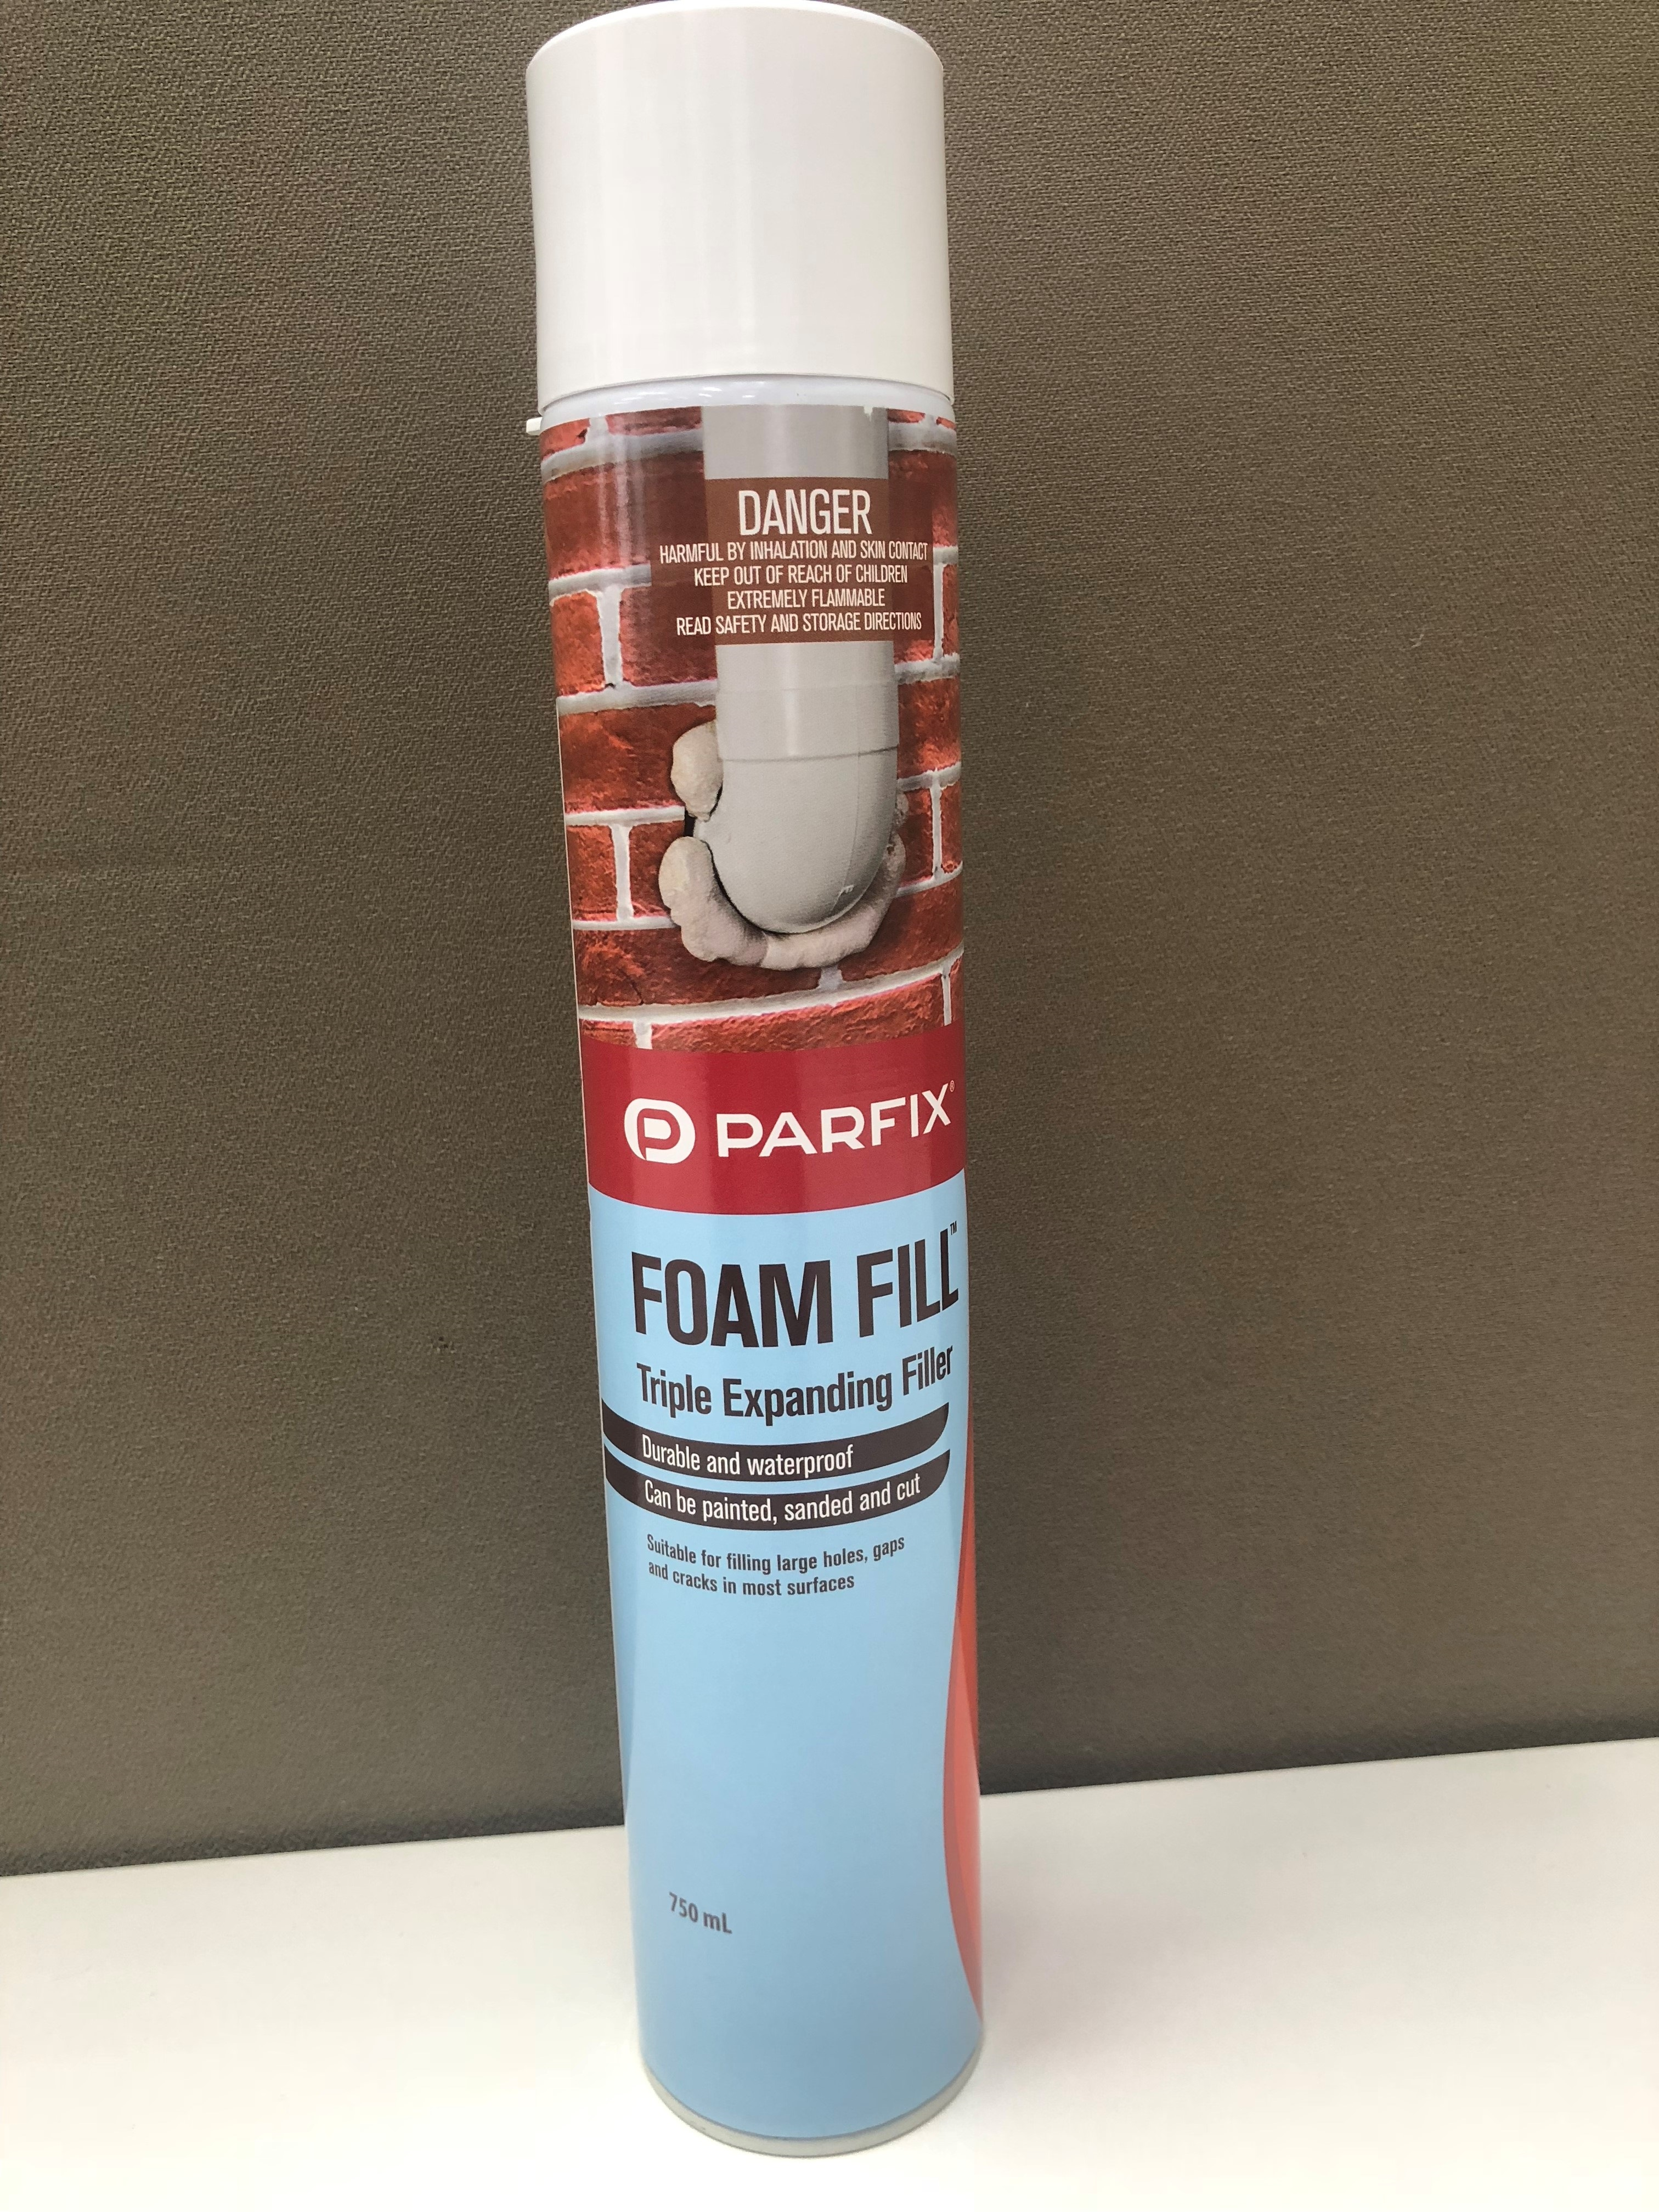 Selleys — Parfix Foam Fill Triple Expanding Filler 340 and